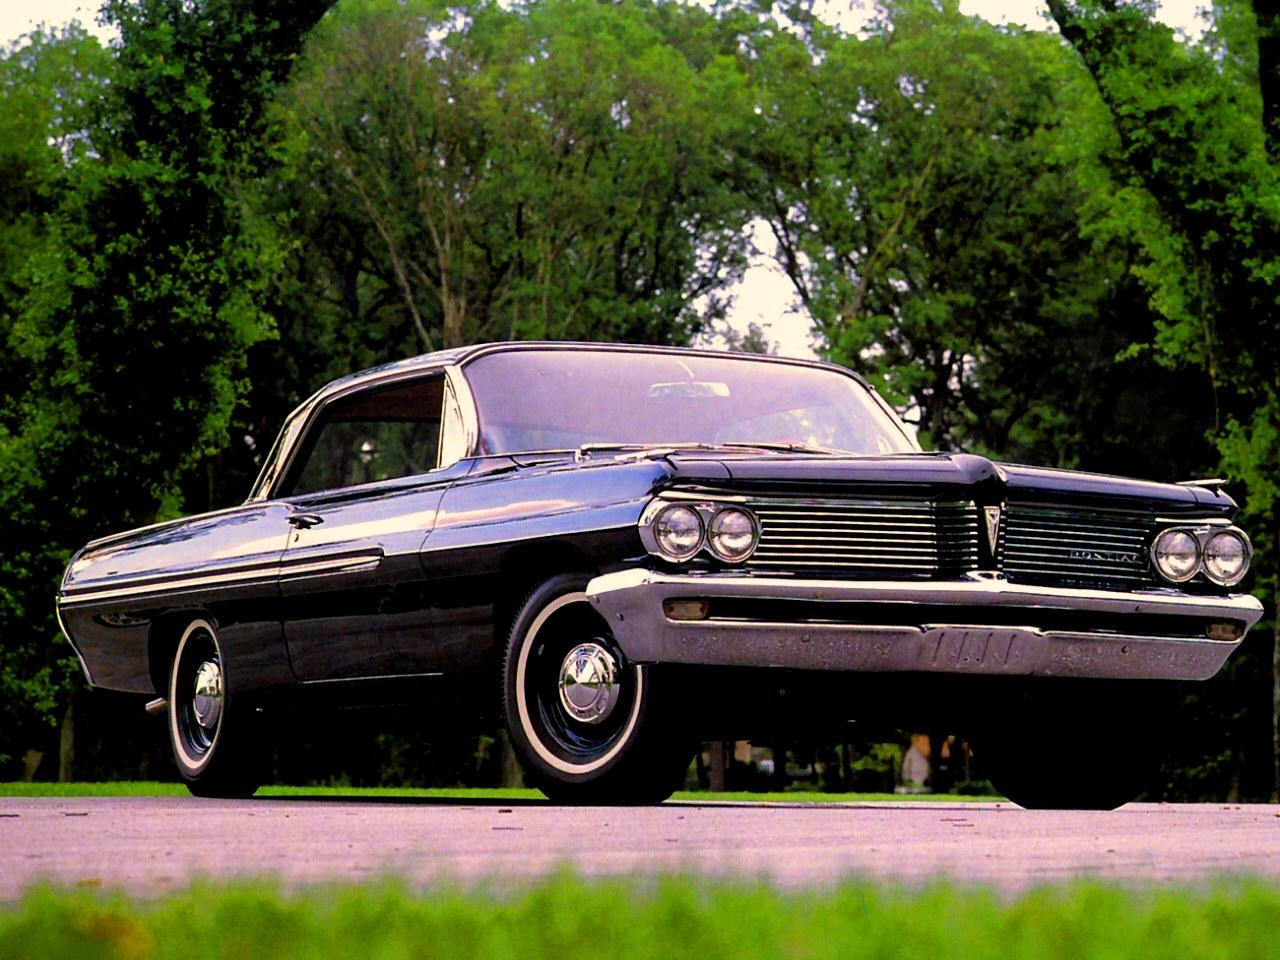 1964 Pontiac Catalina Super Duty Related Keywords Suggestions 421 Os Subestimados